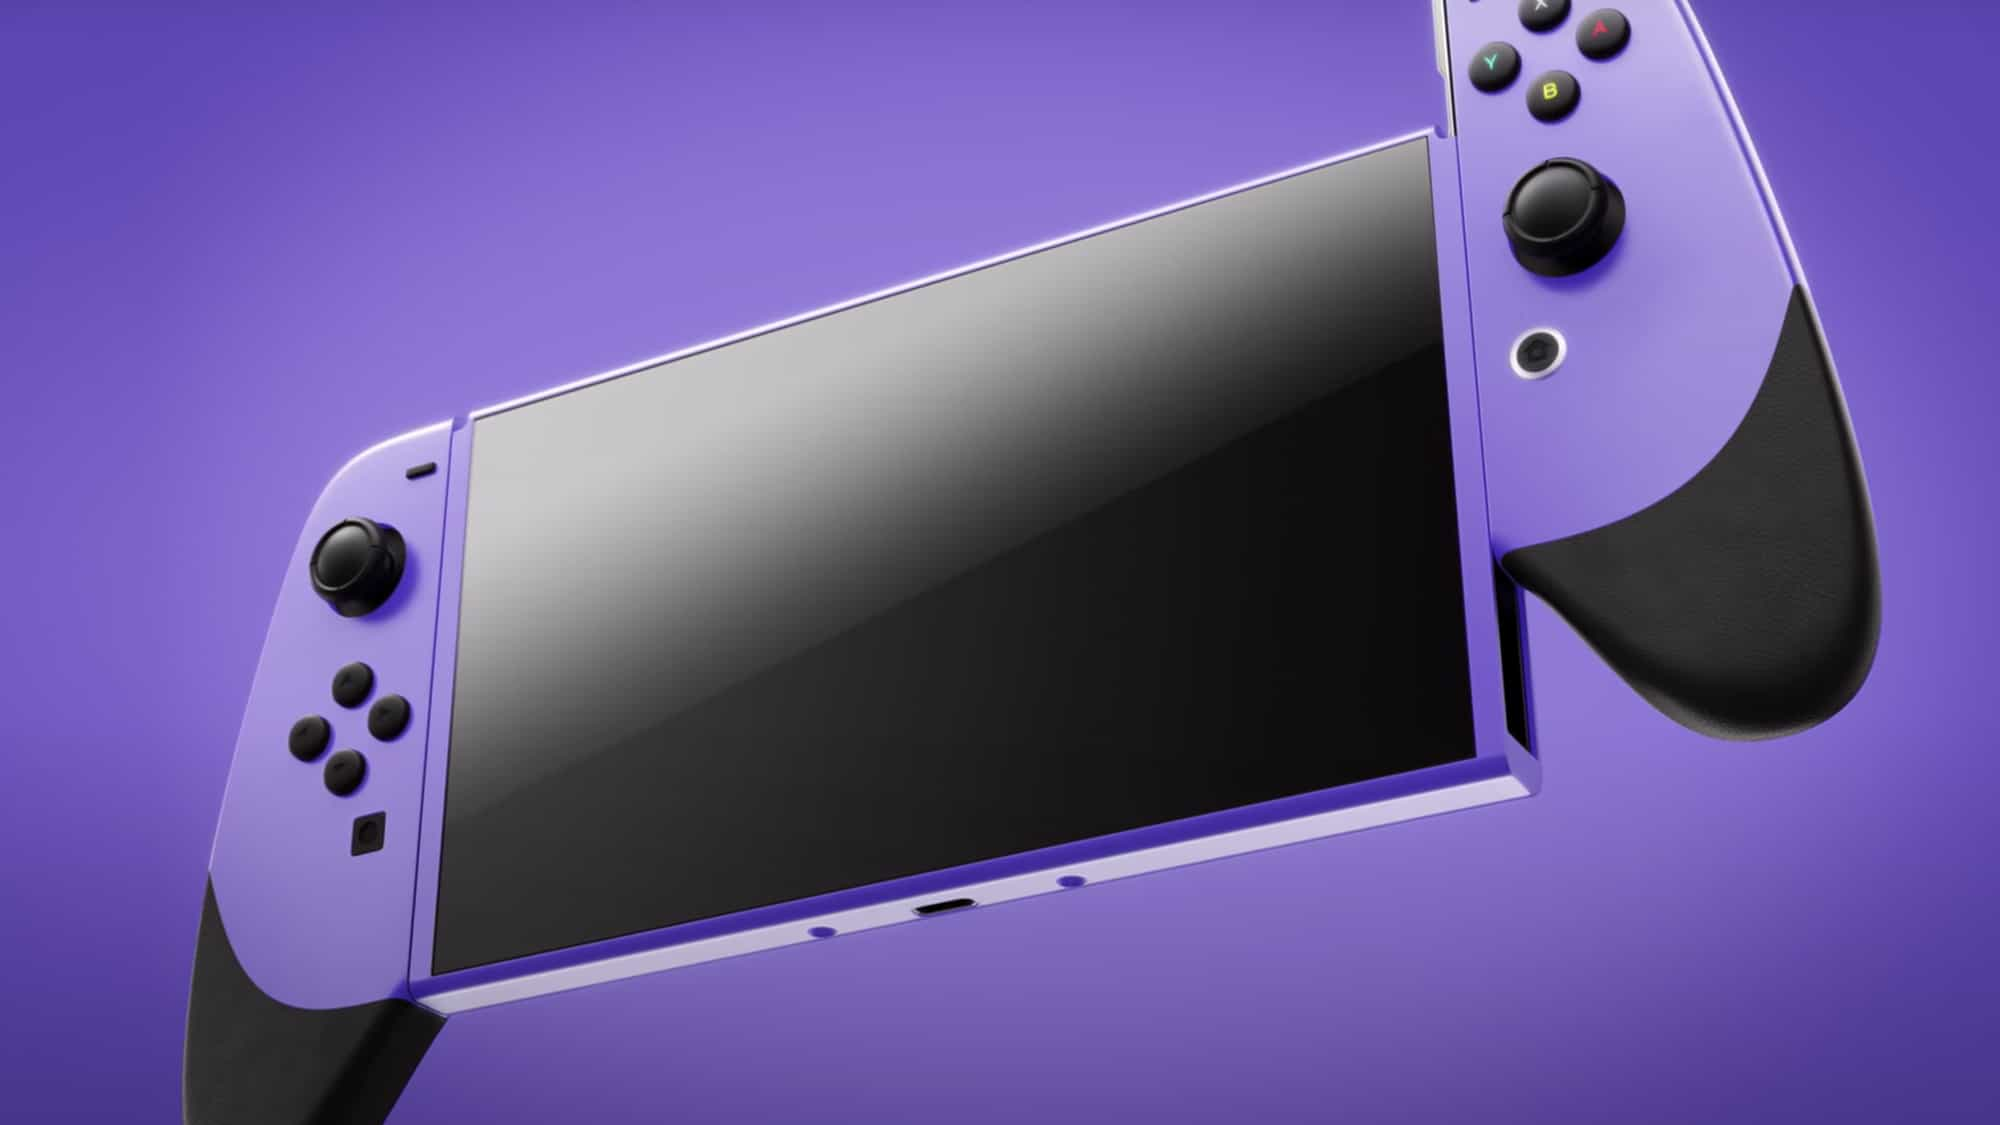 Nintendo finalmente responde a esos rumores de Switch Pro